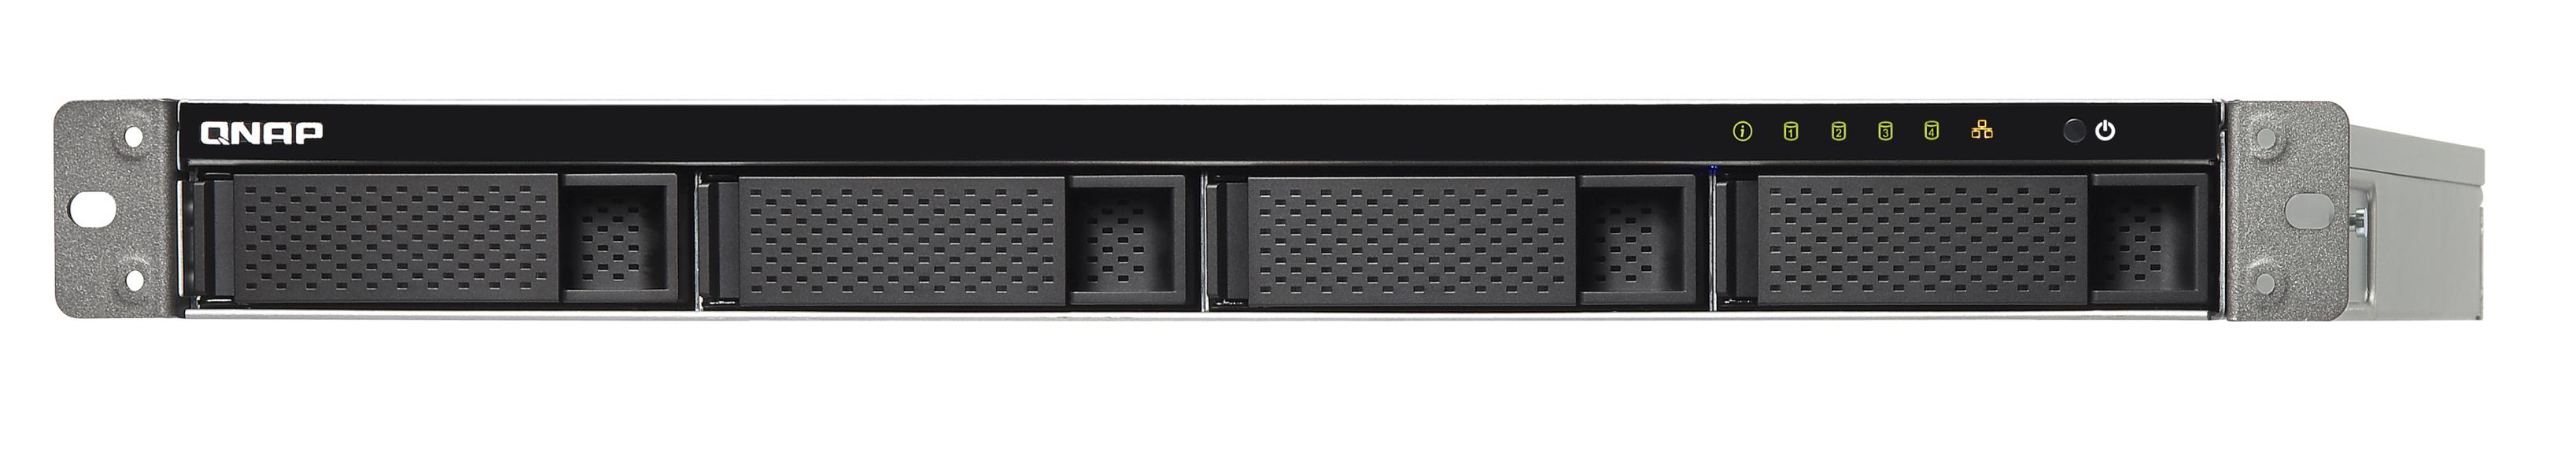 QNAP TS-431XU-RP (1,7GHz/2GB/4xSATA/10GbE SFP+)